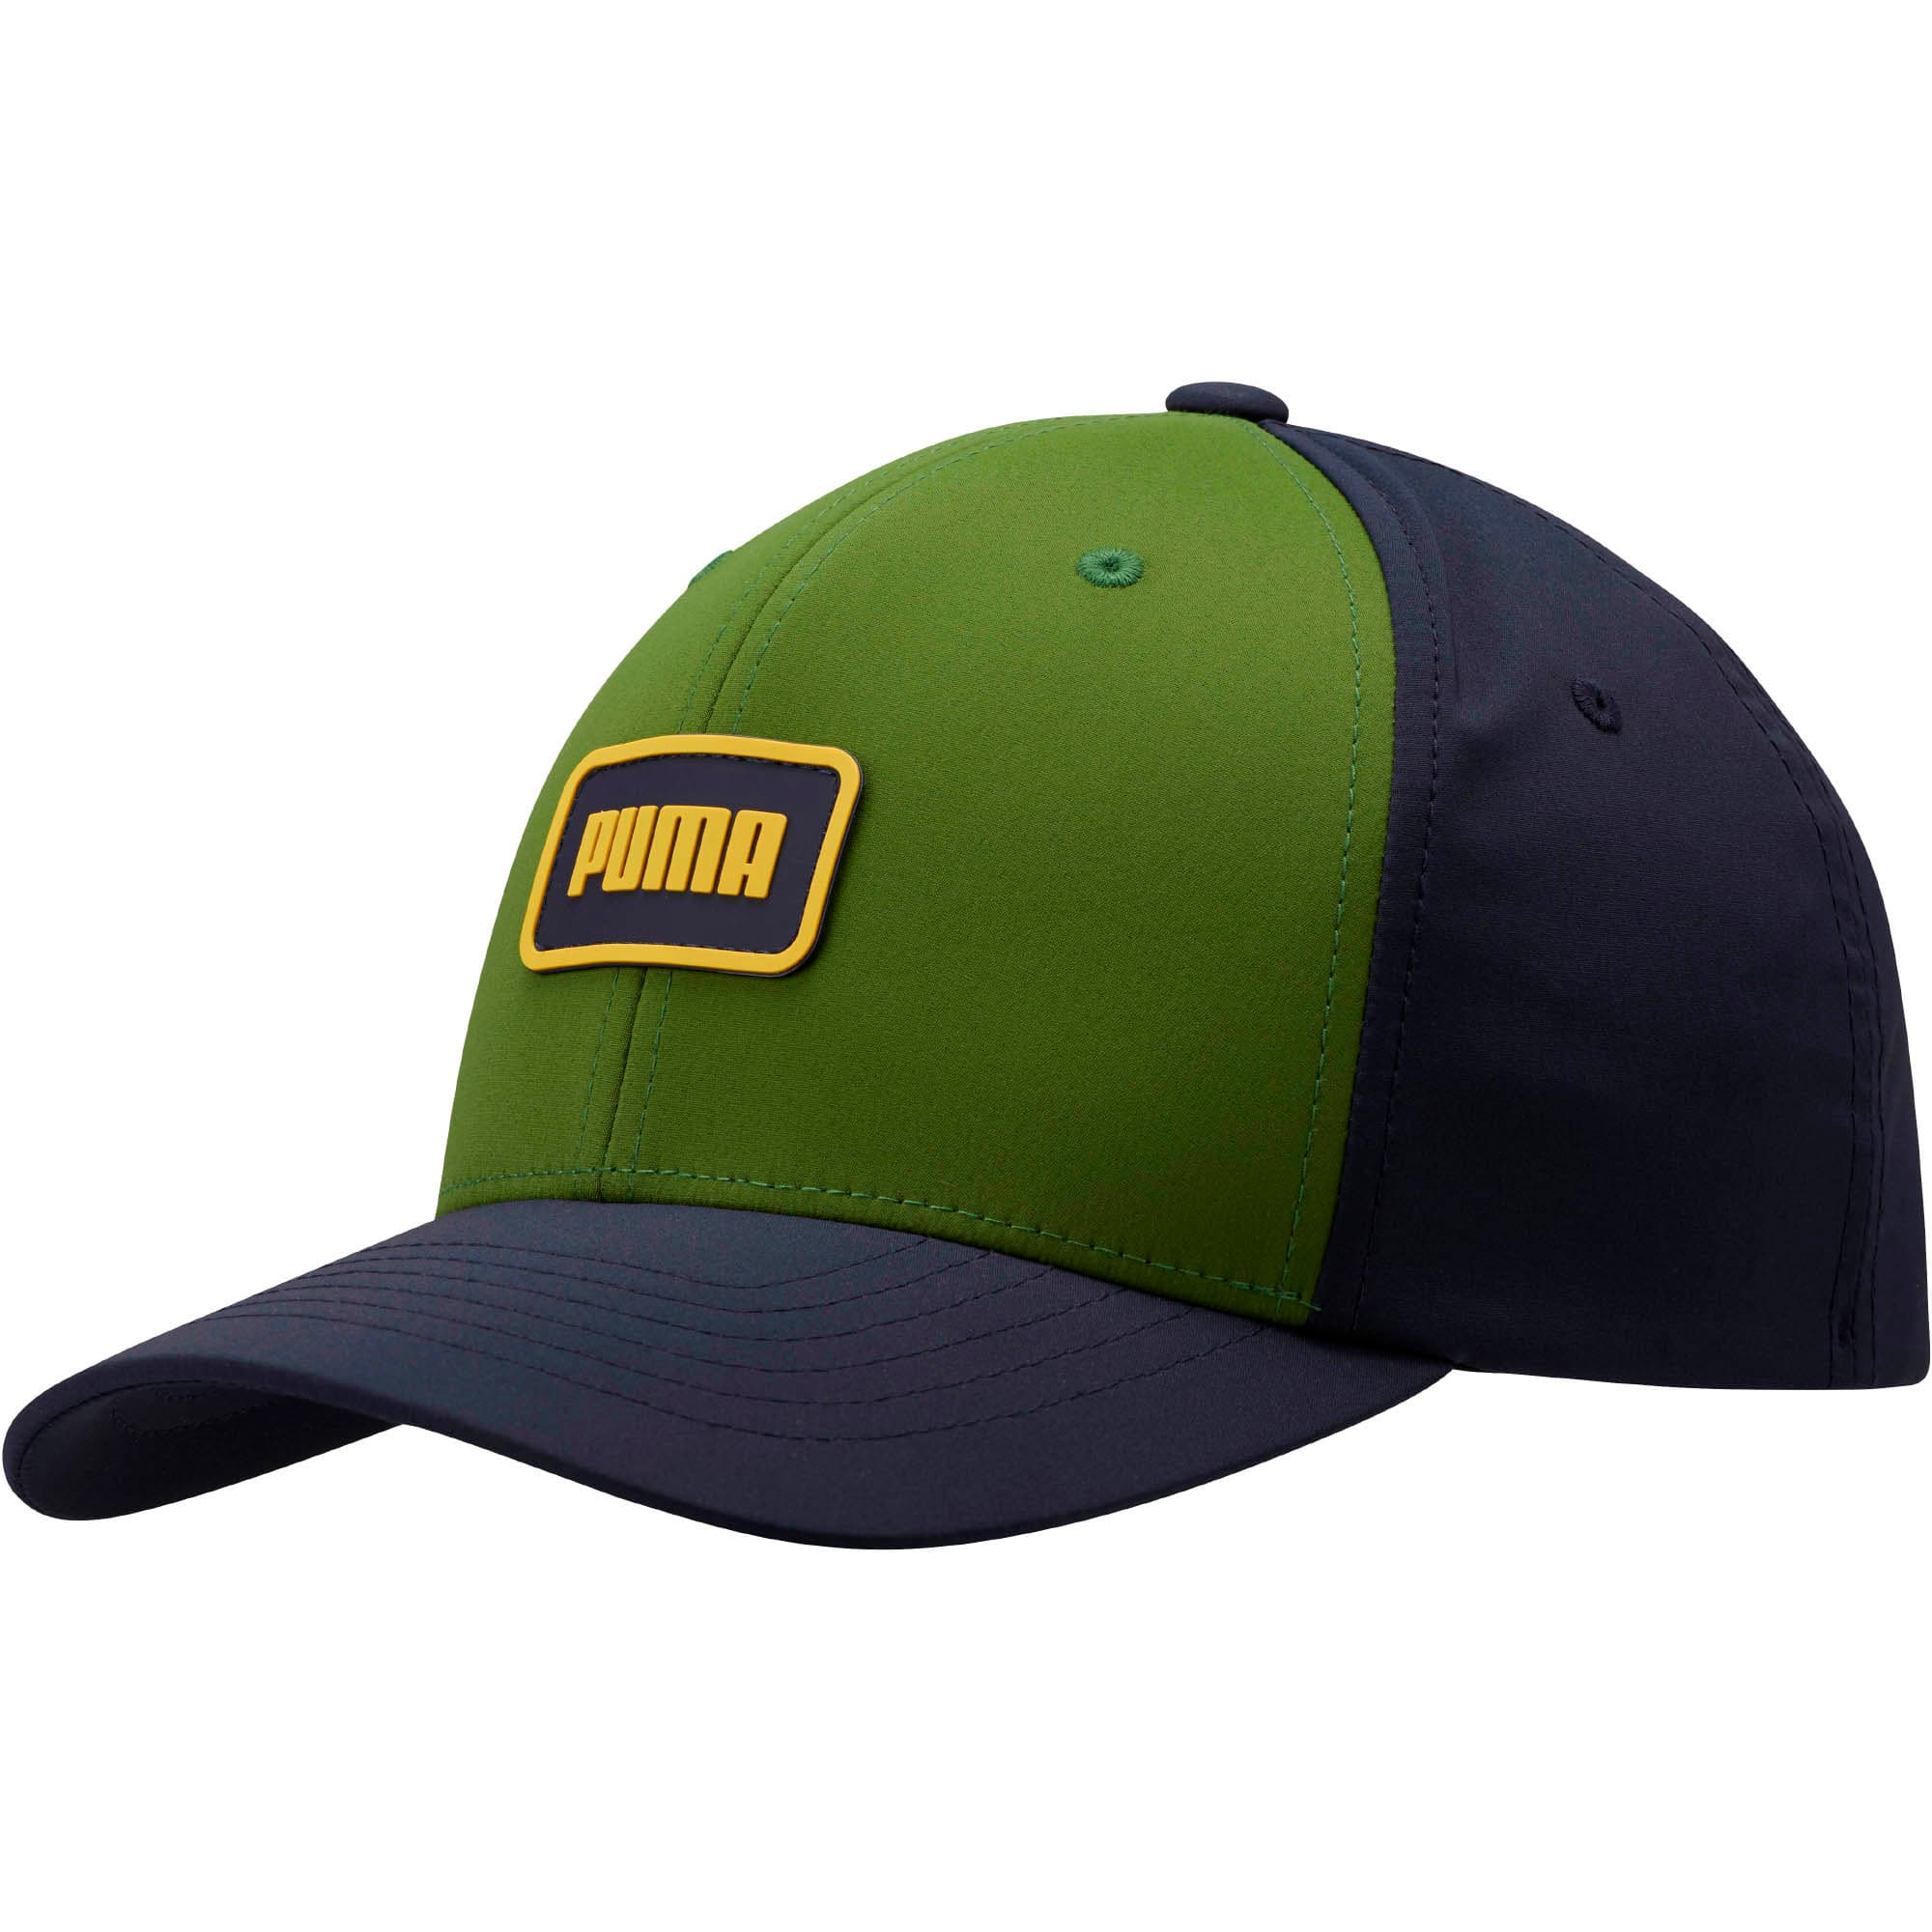 Thumbnail 1 of Clutch Flexfit Cap, Navy/Green, medium